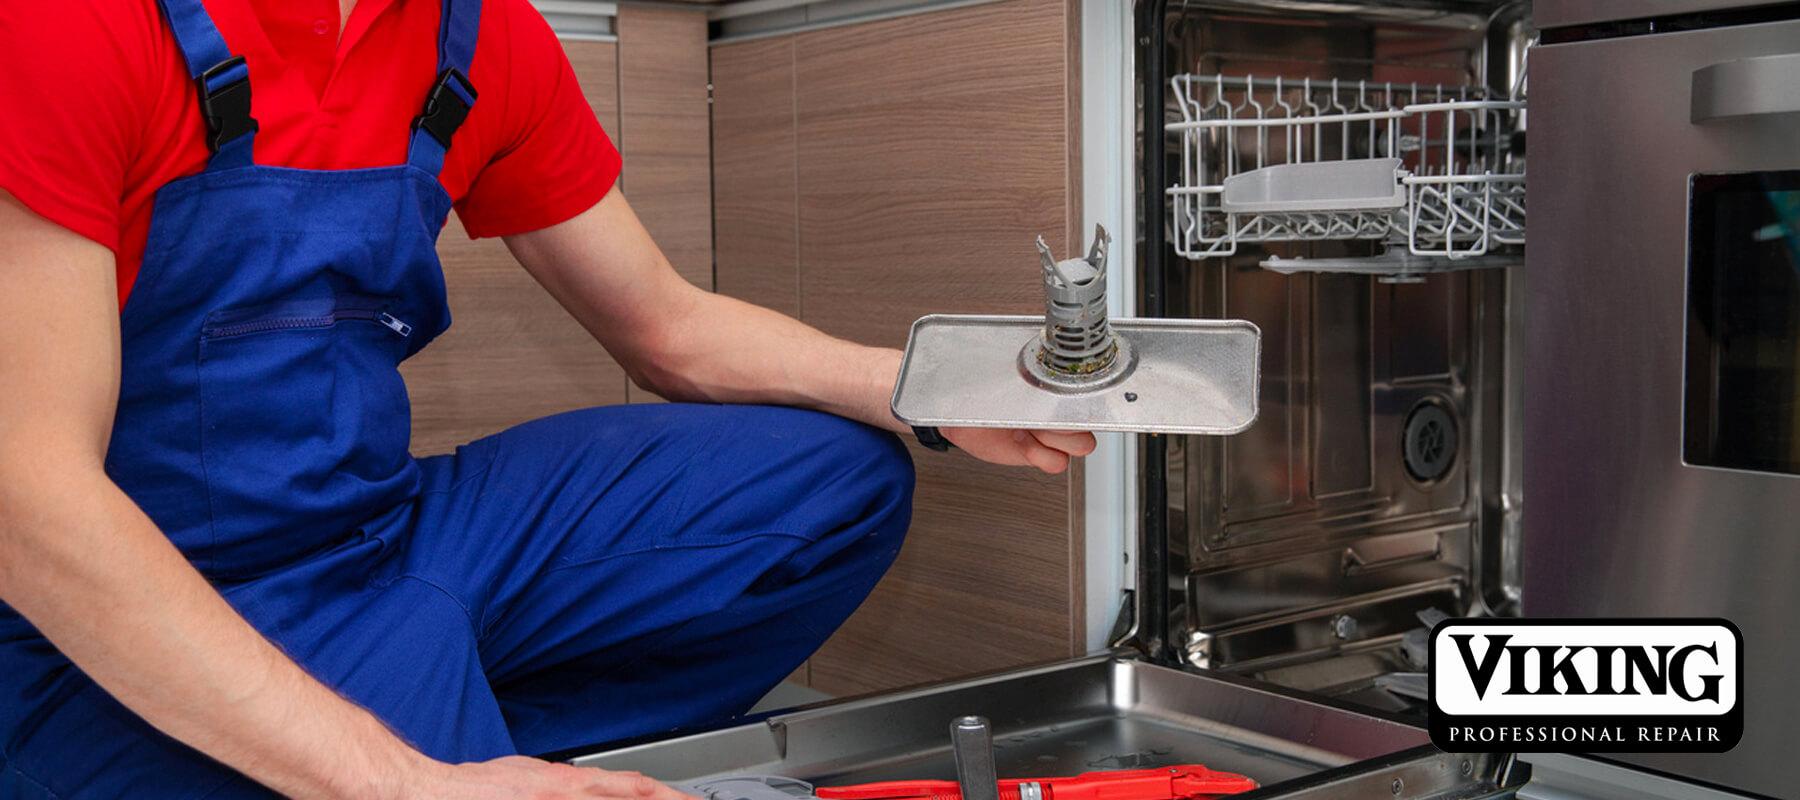 Authorized Viking Appliance Repair Service Beverly Hills | Professional Viking Repair